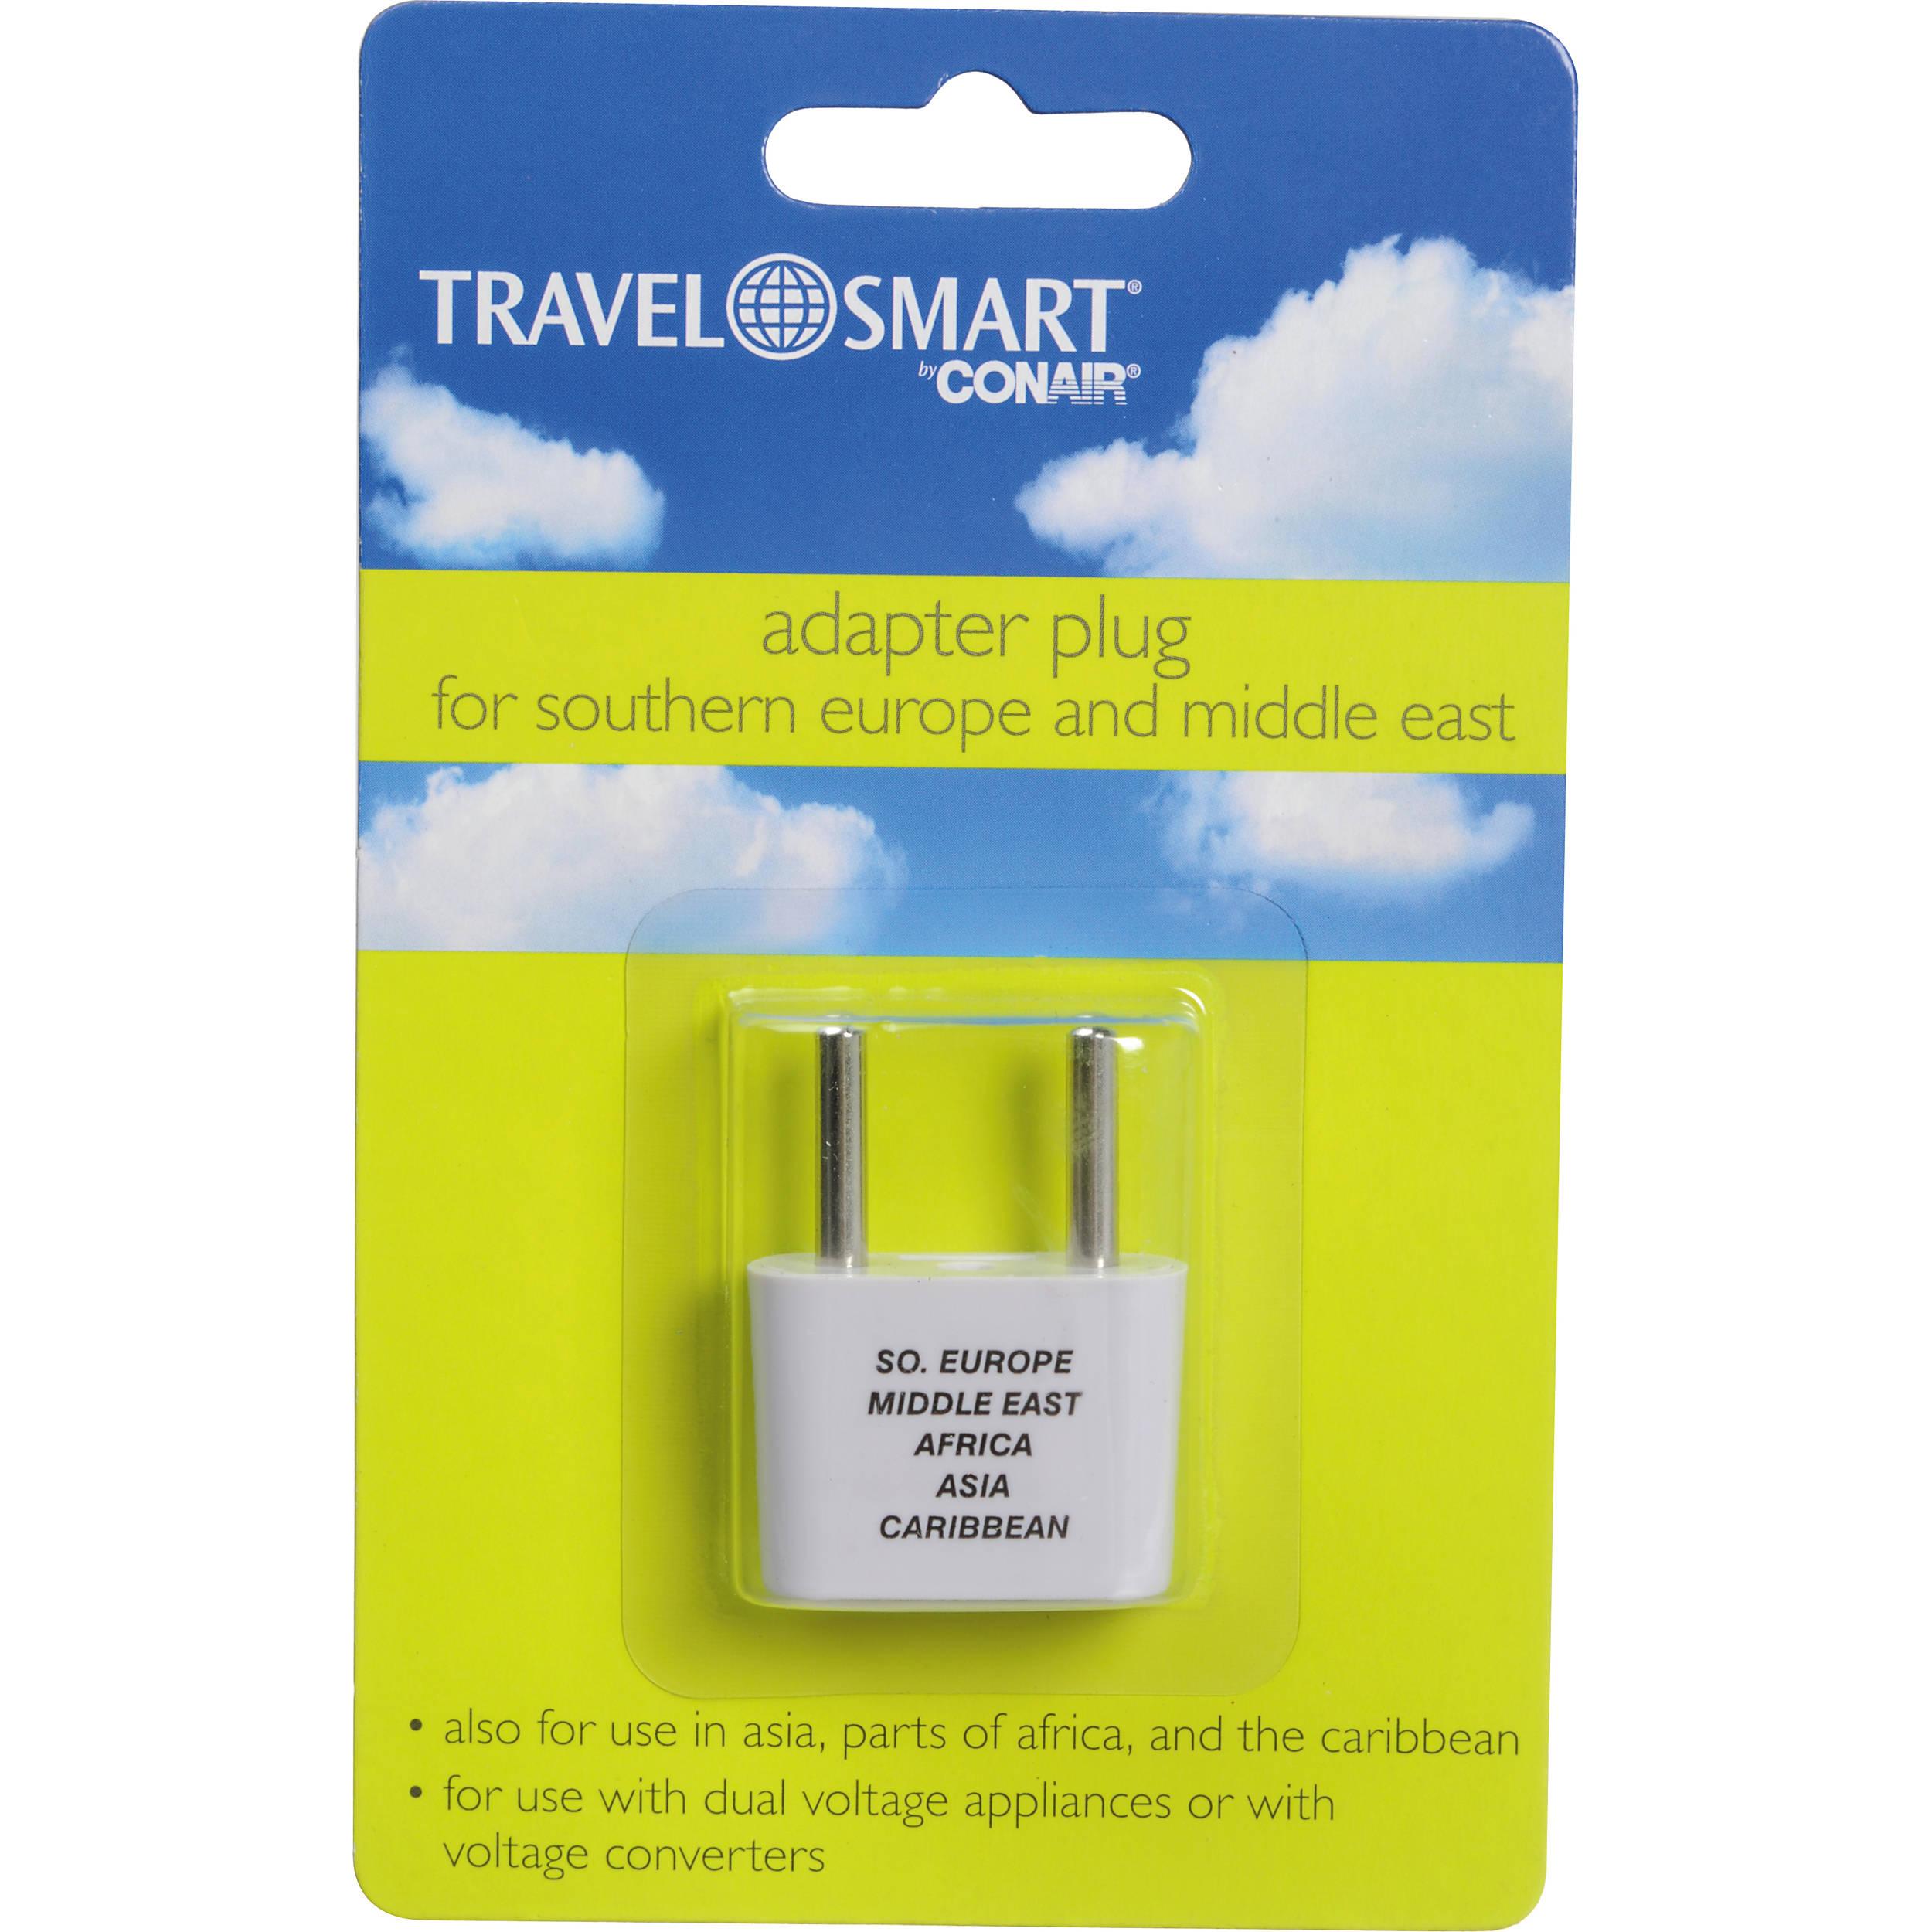 Travel Smart Accessories Reviews